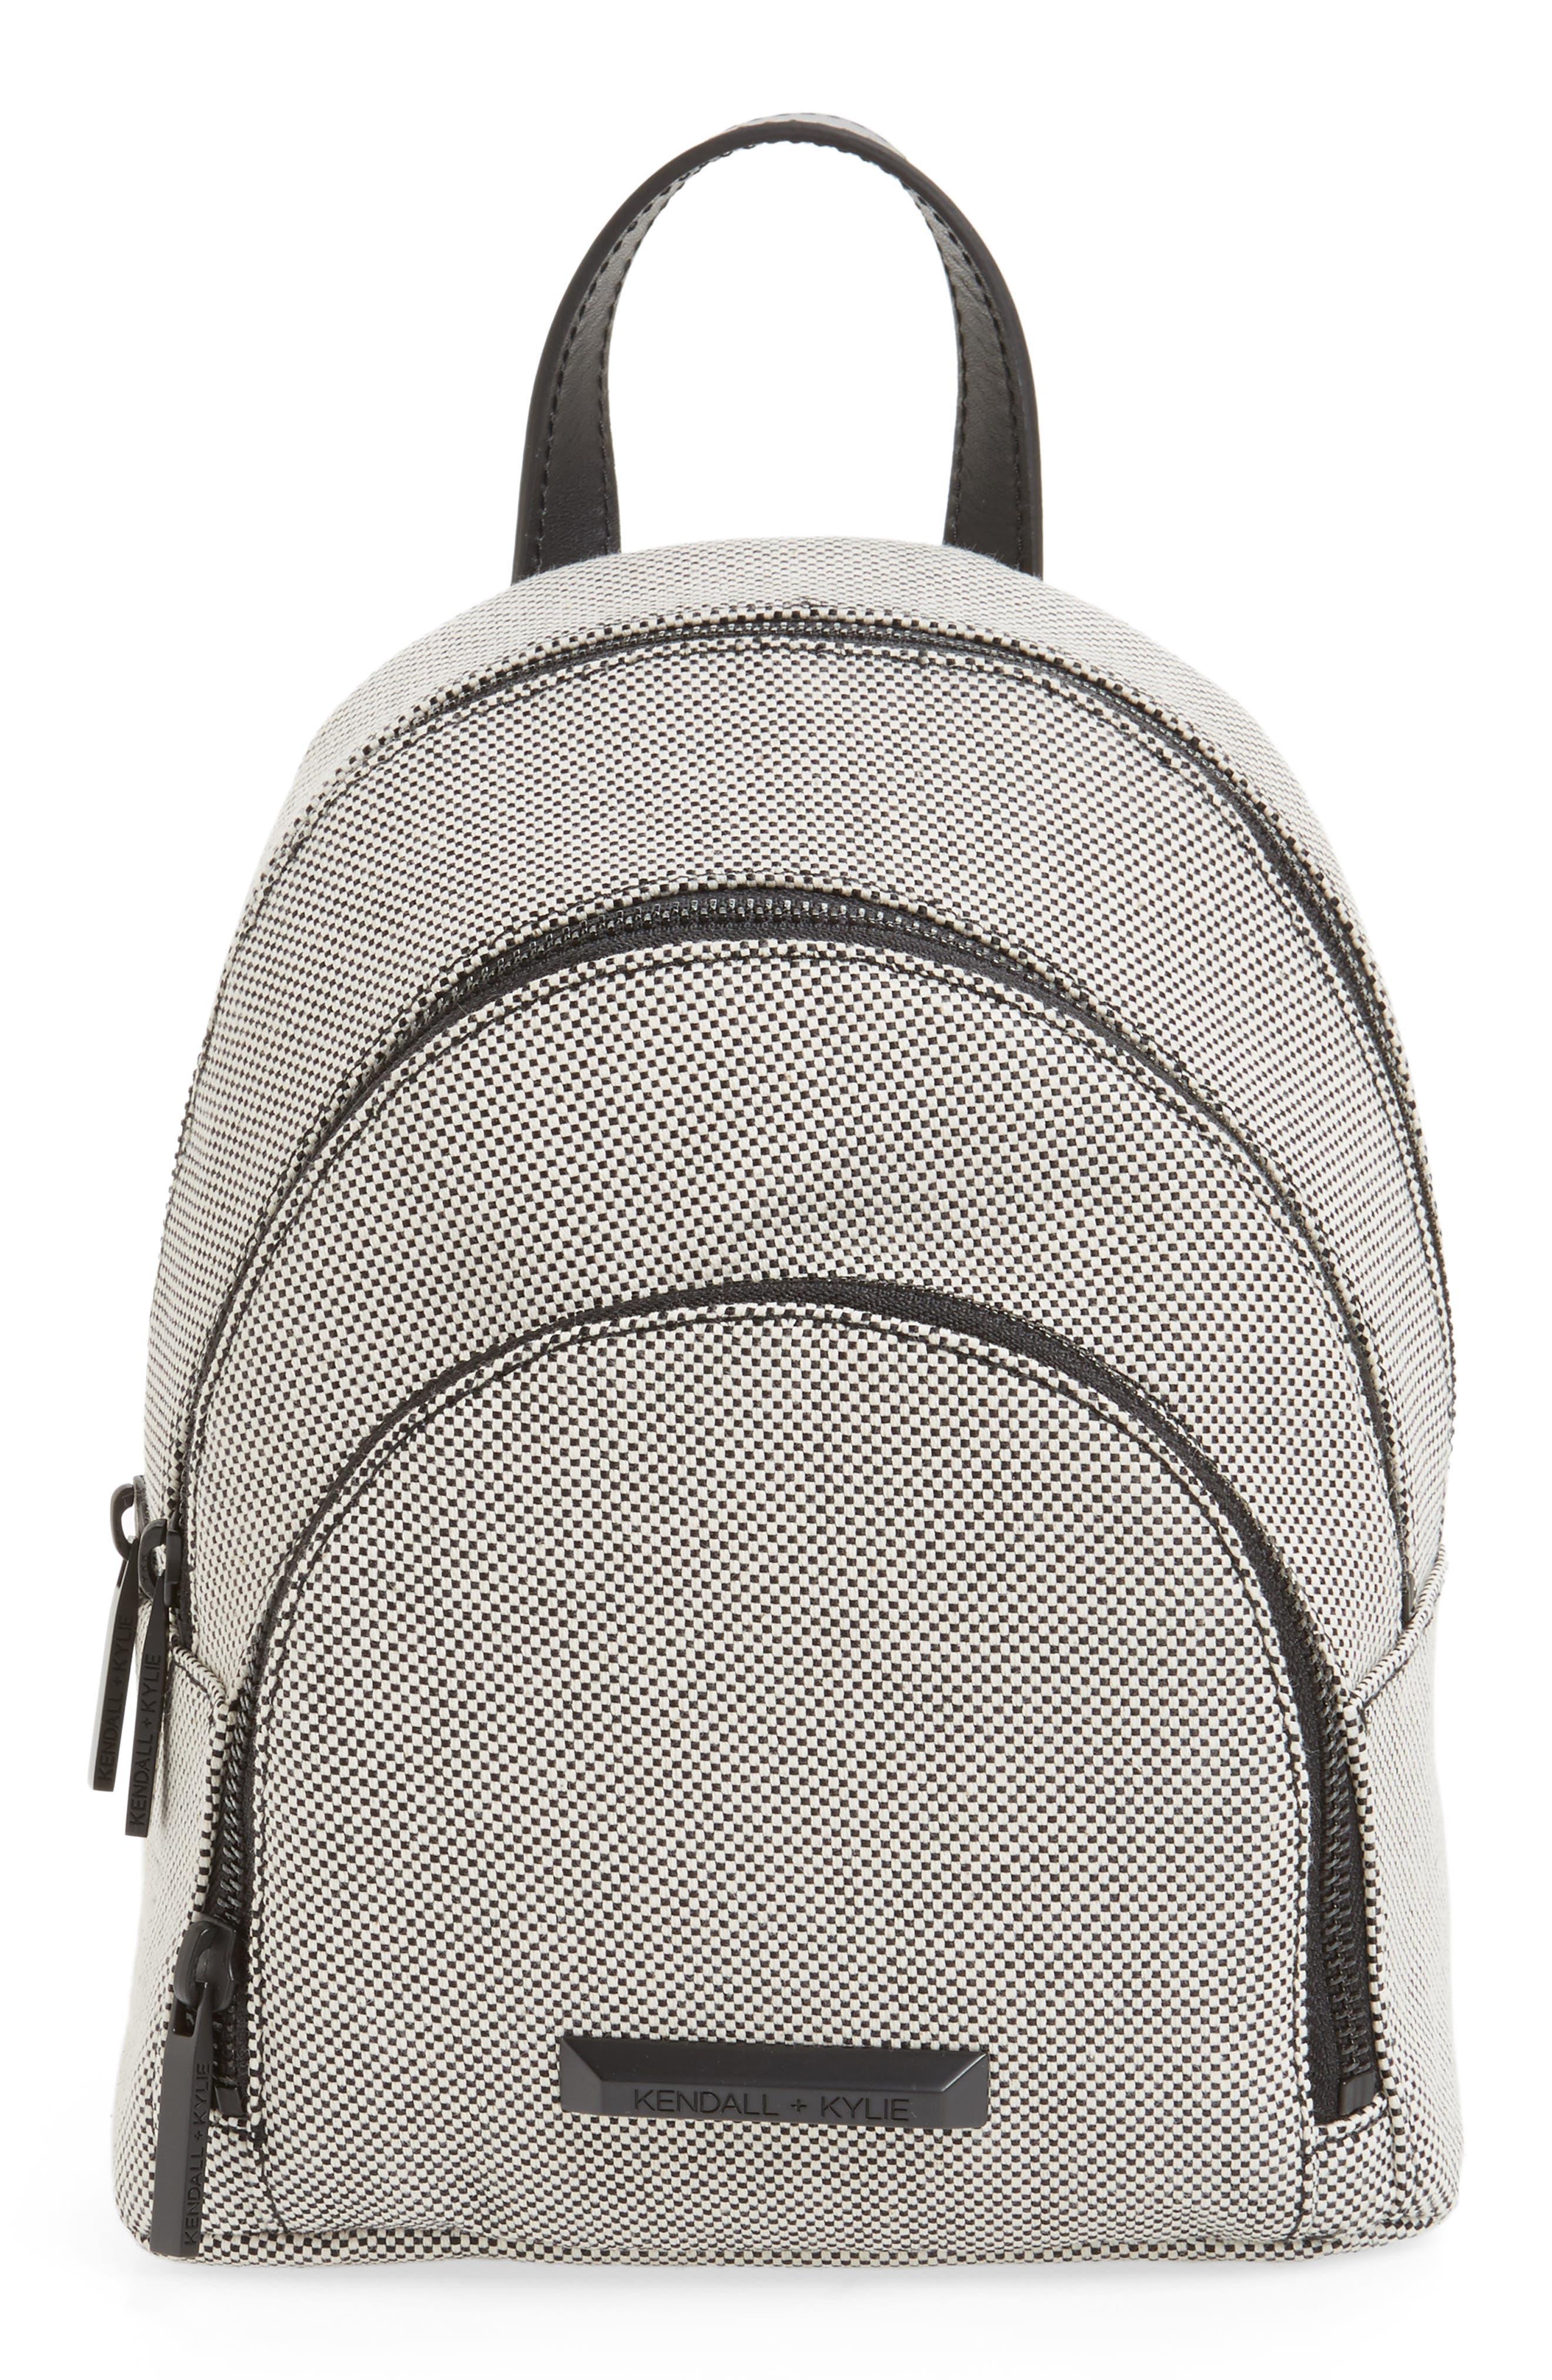 Alternate Image 1 Selected - KENDALL + KYLIE Mini Sloane Canvas Backpack